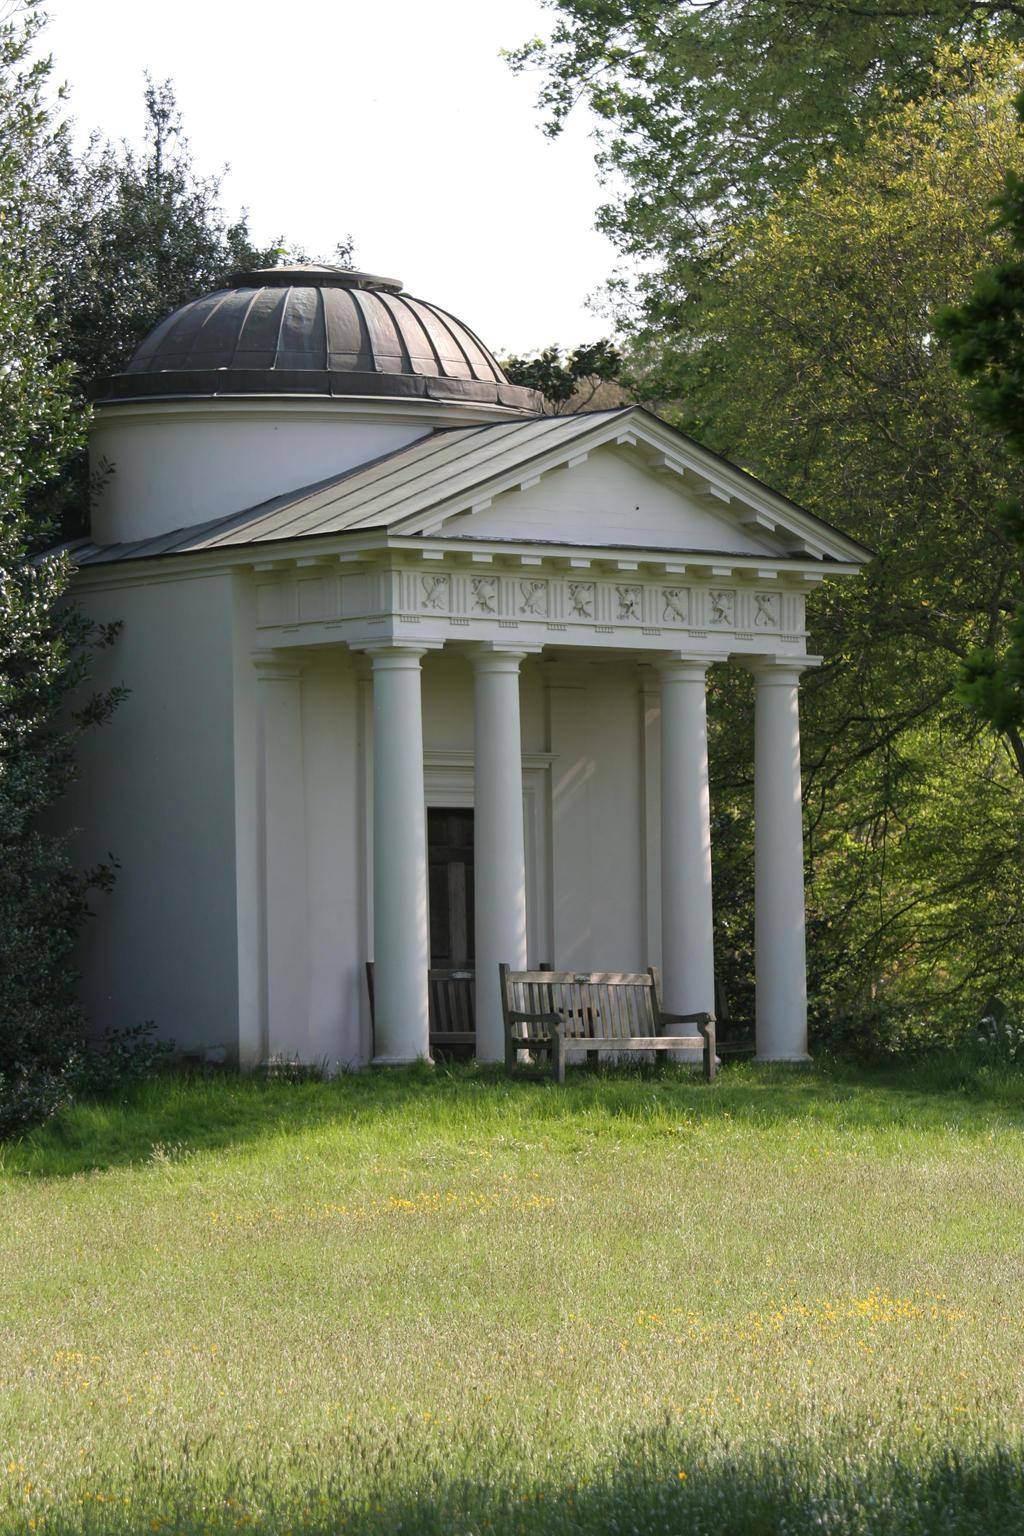 Kew garden stock 1 by Random-Acts-Stock